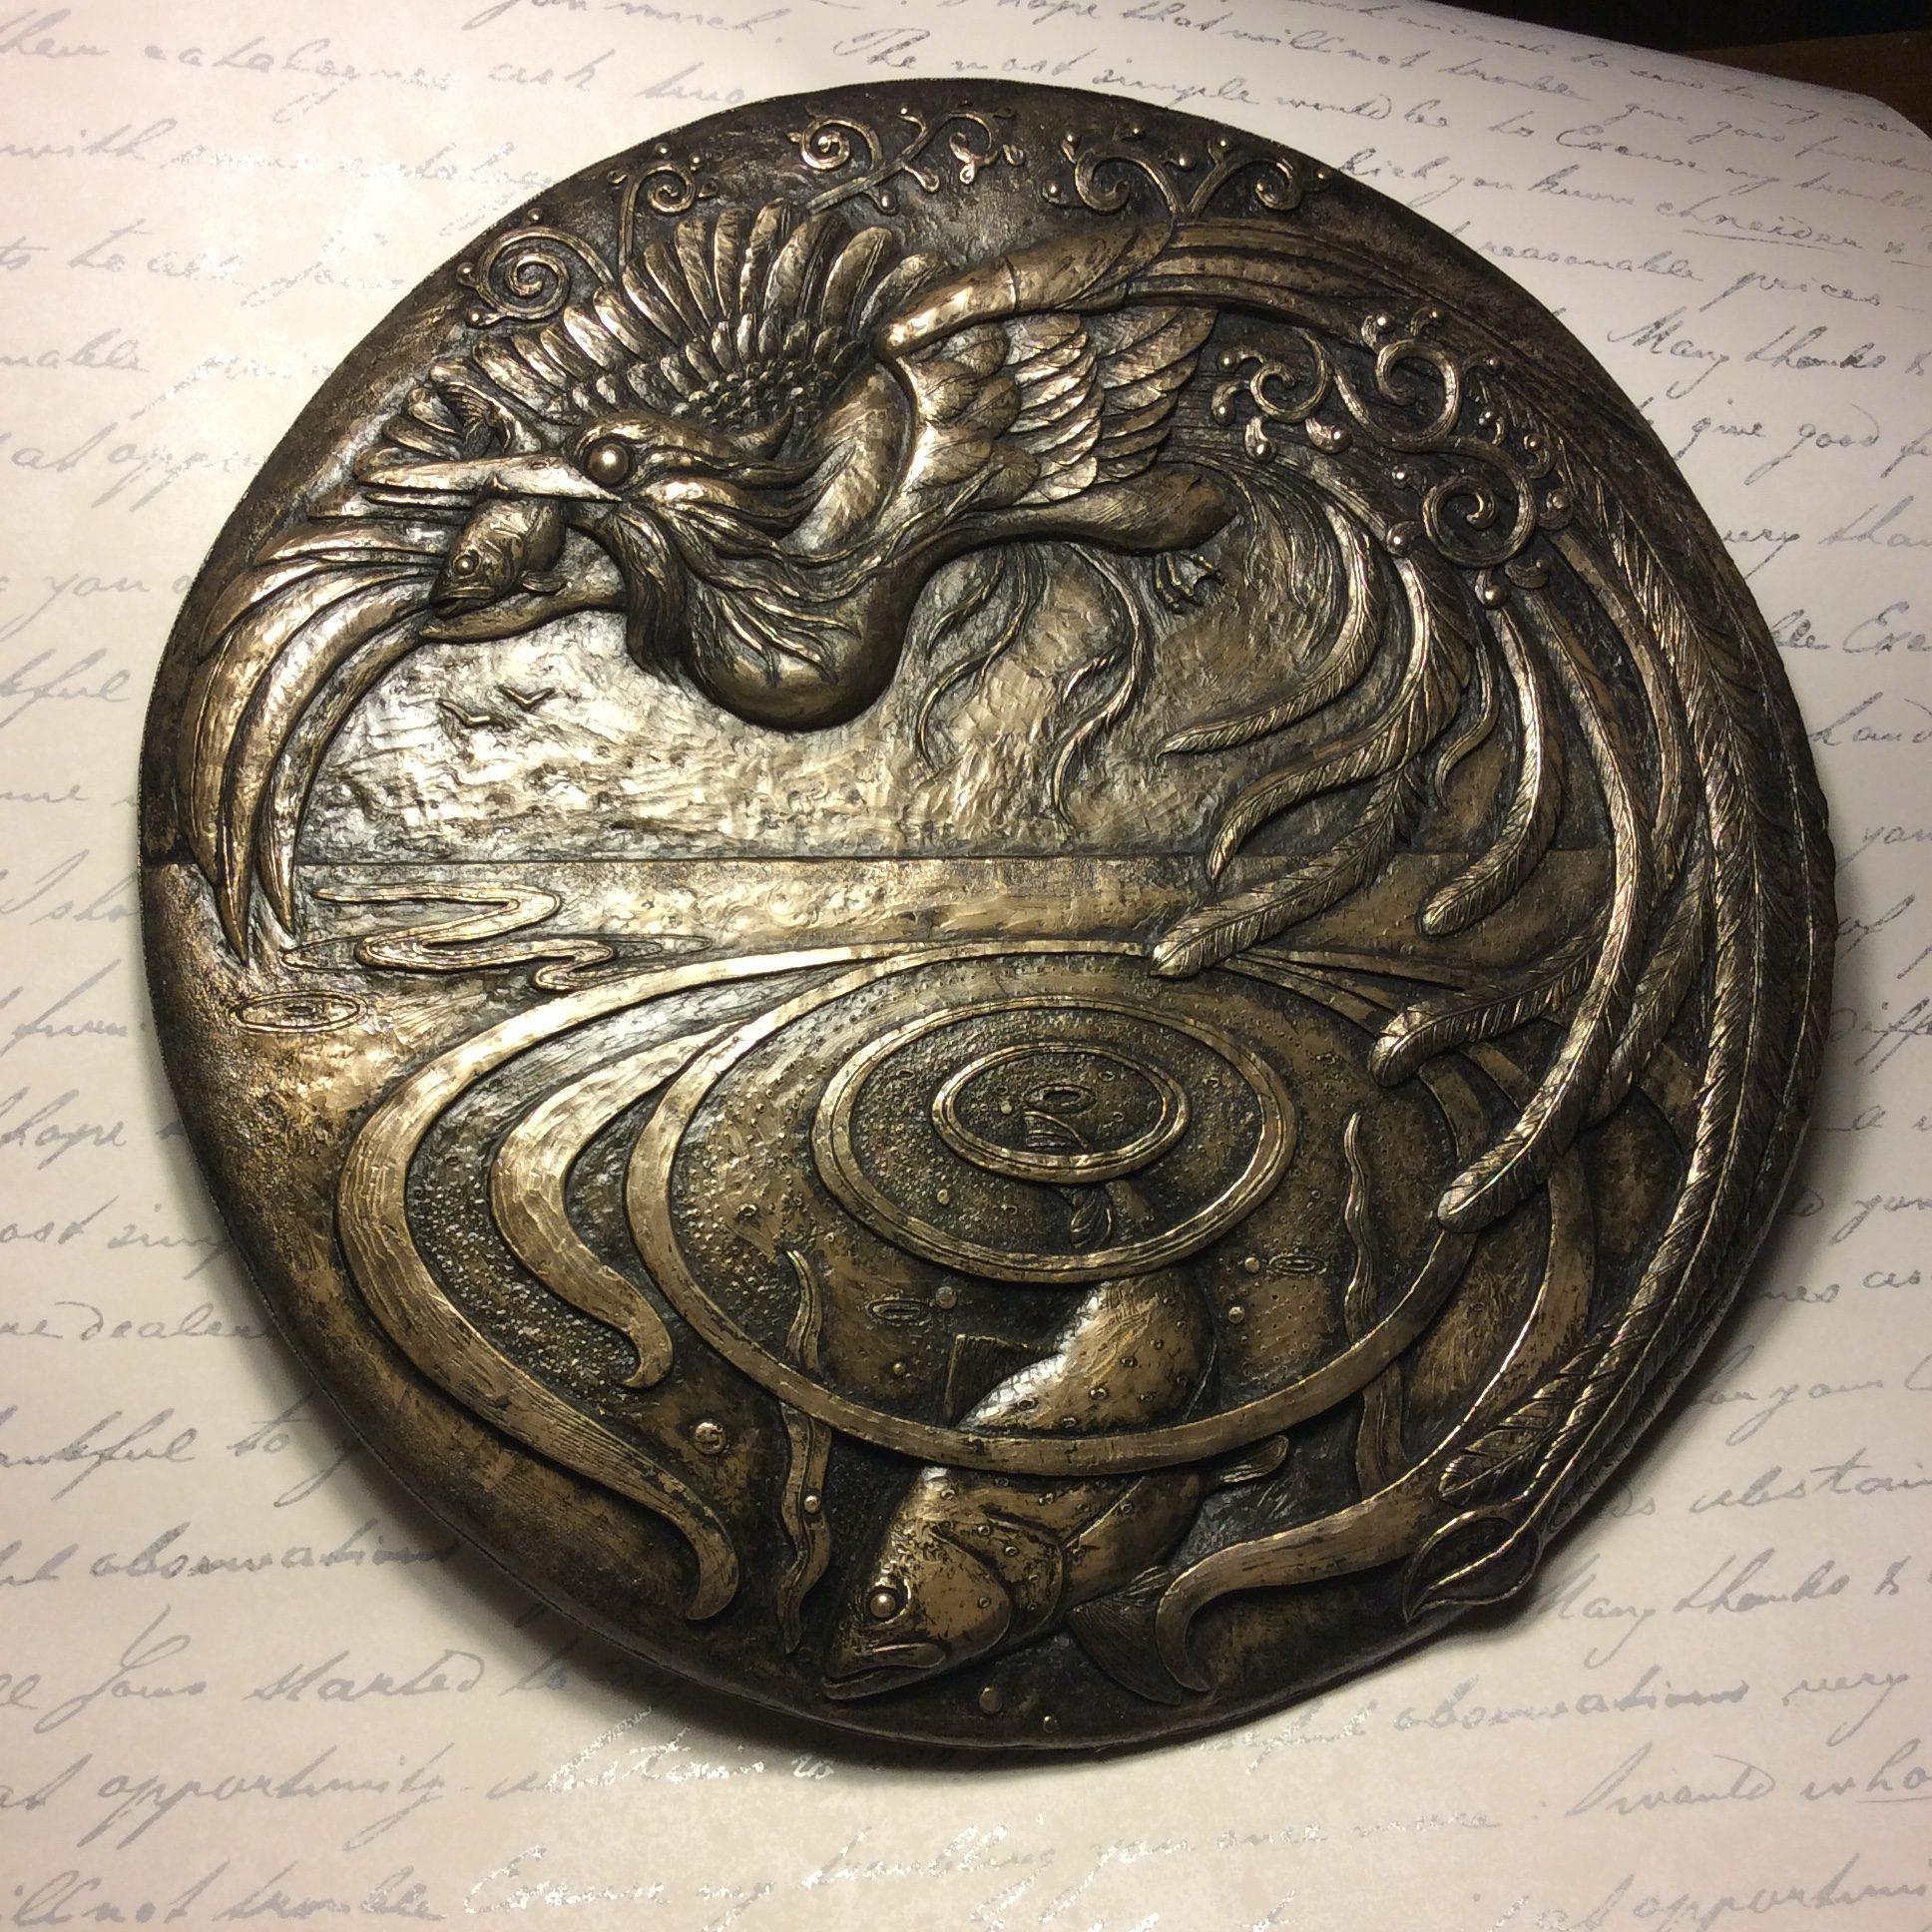 Halcyon Days plaque in bronze